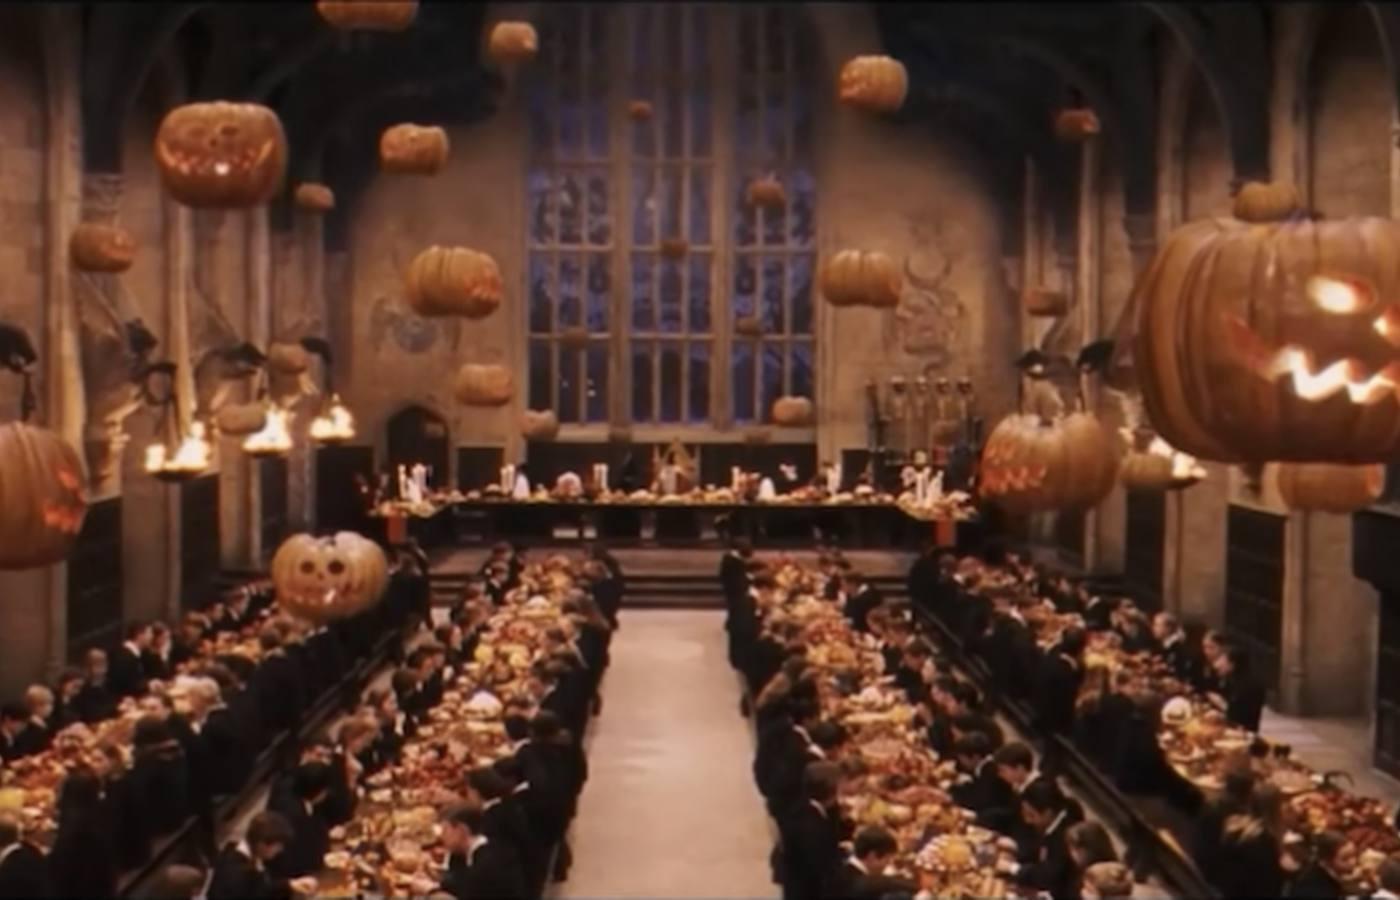 Harry Potter Halloween Decor: Floating Pumpkins